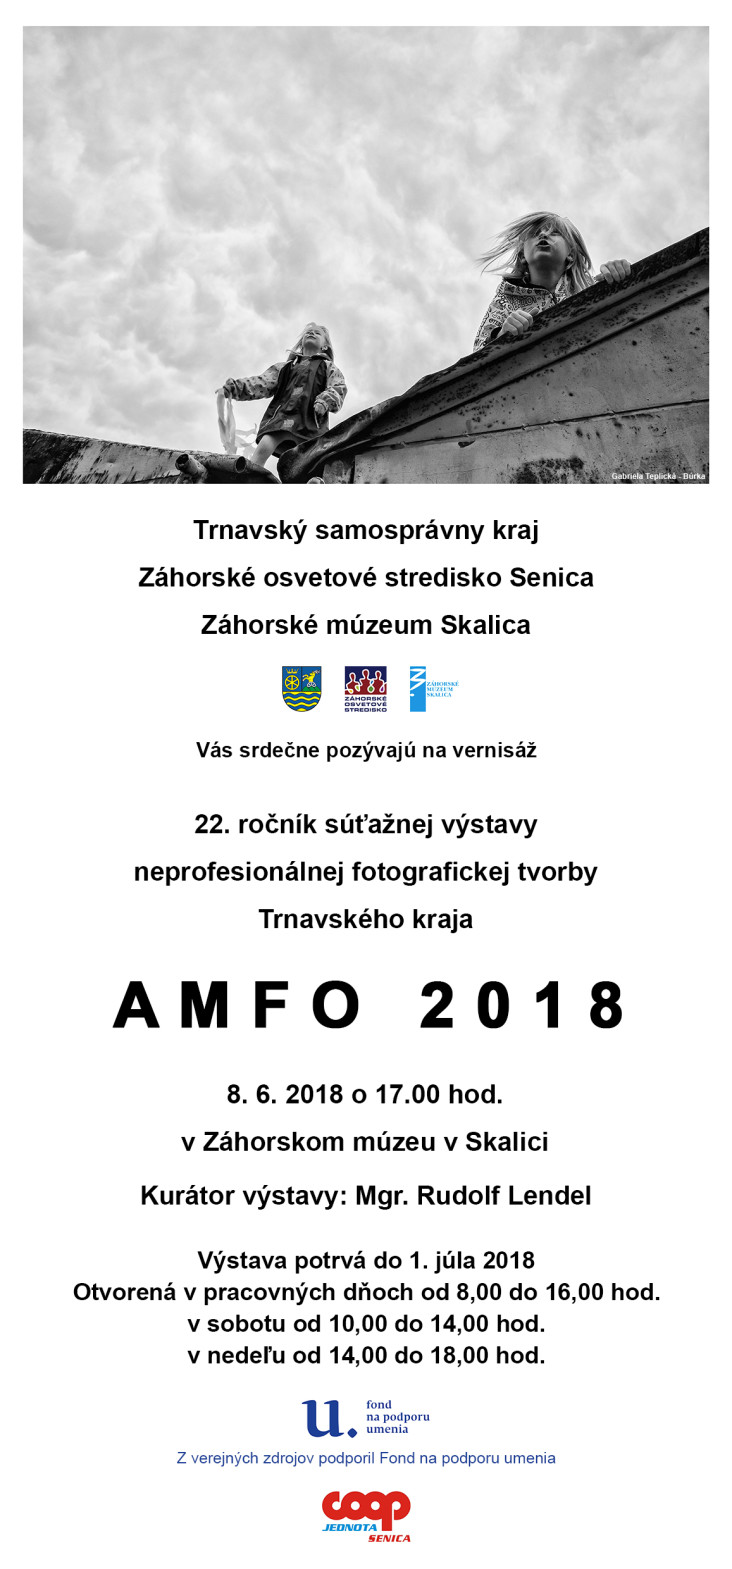 AMFO_2018_8.6.2018_pozvanka